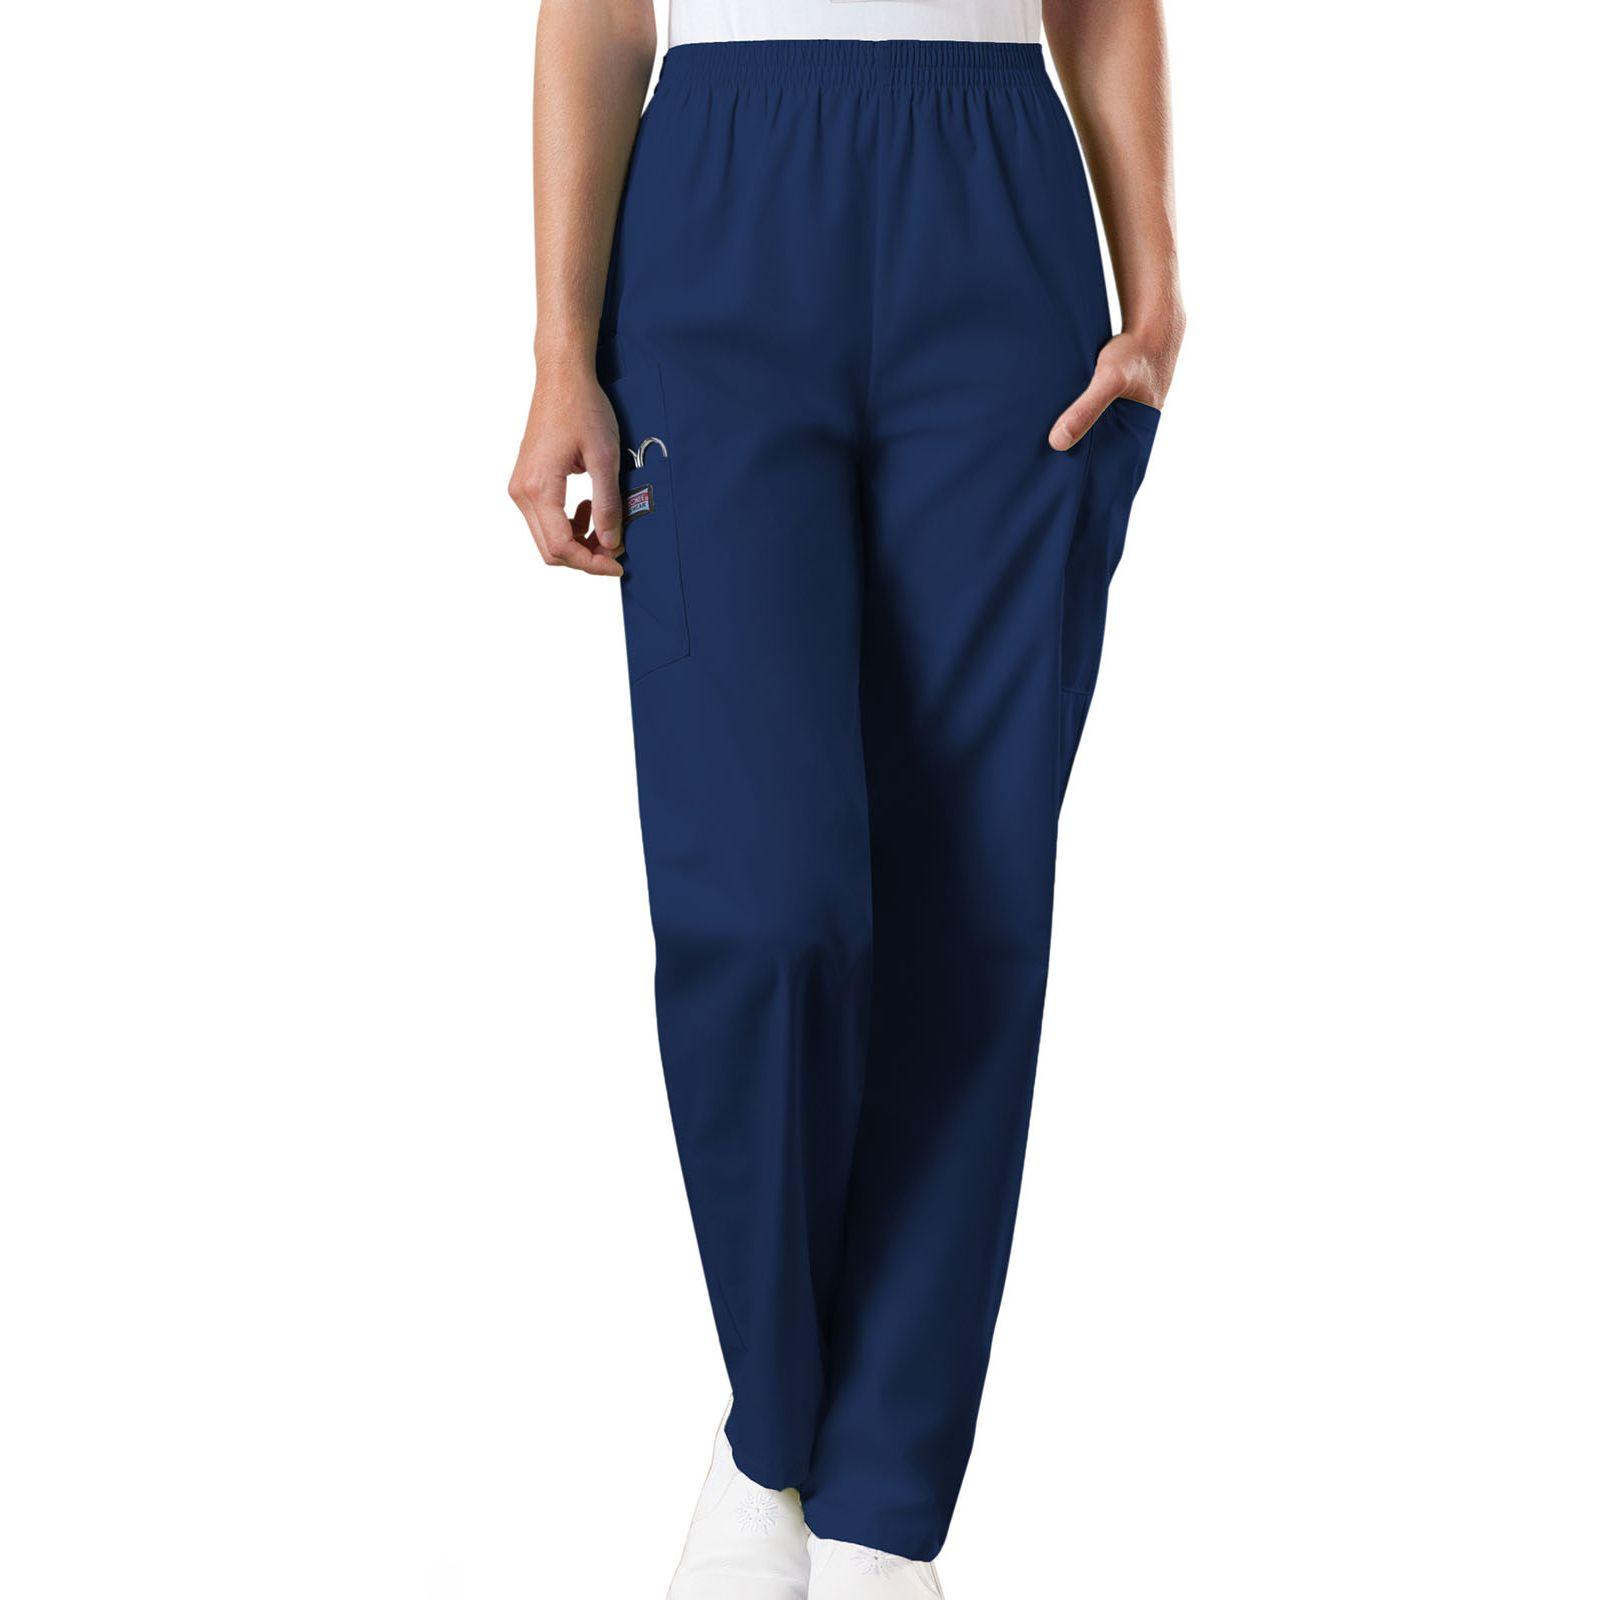 Pantalon médical élastique Unisexe, Cherokee Workwear Originals (4200) bleu marine